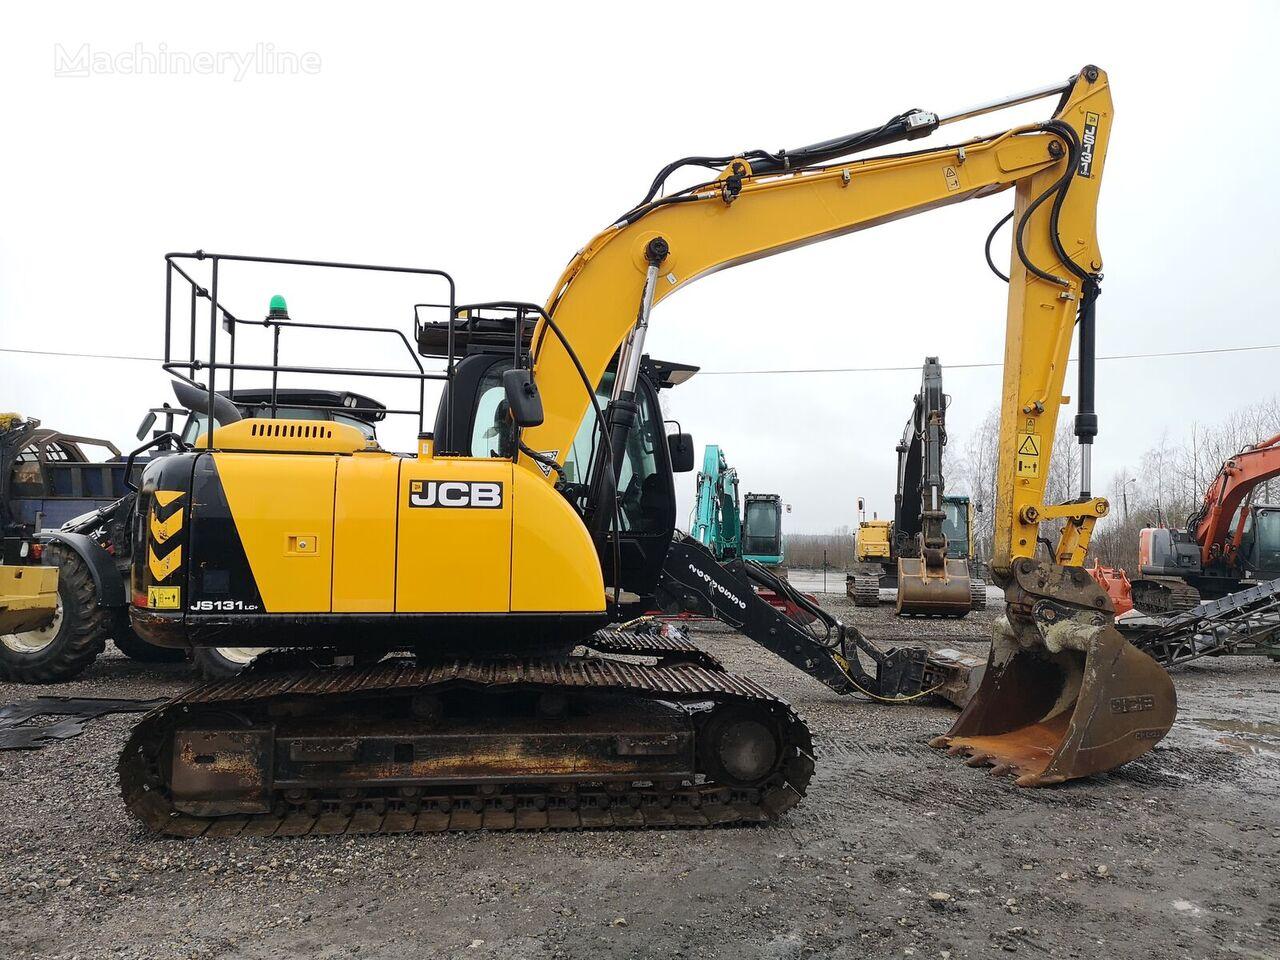 JCB 131 tracked excavator